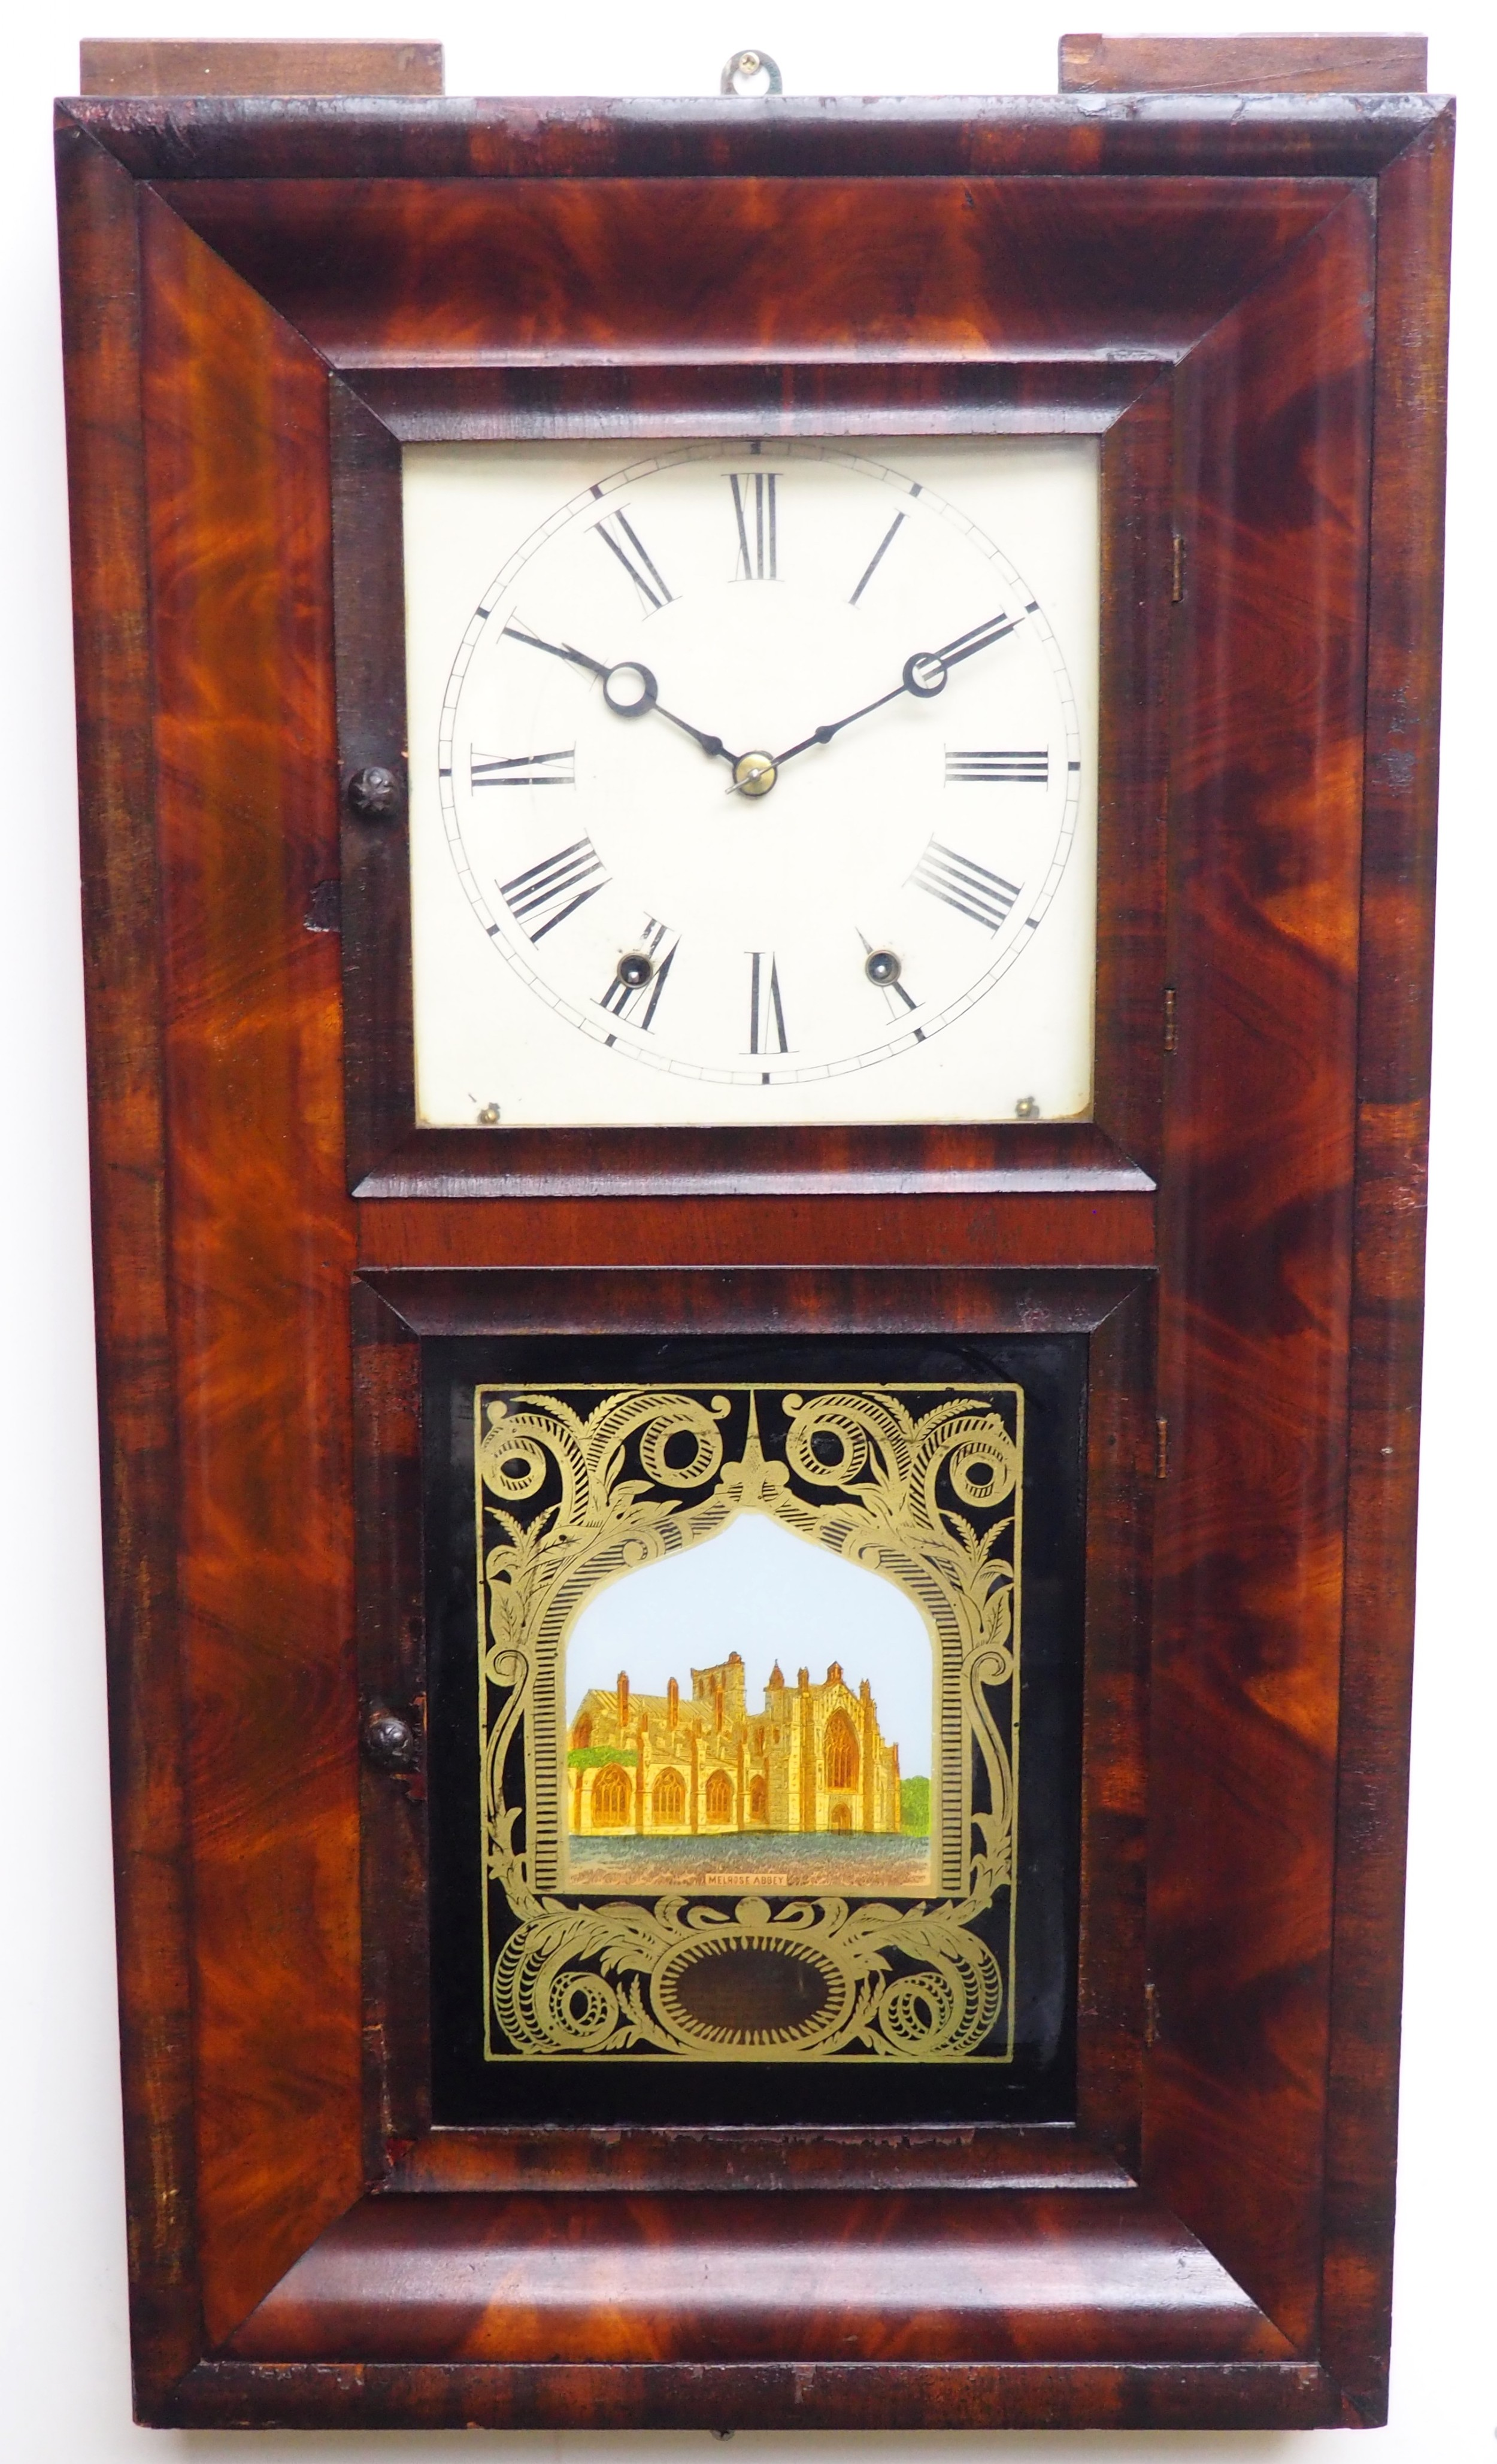 important antique american ogee wall clock weight driven striking wallmantel clock